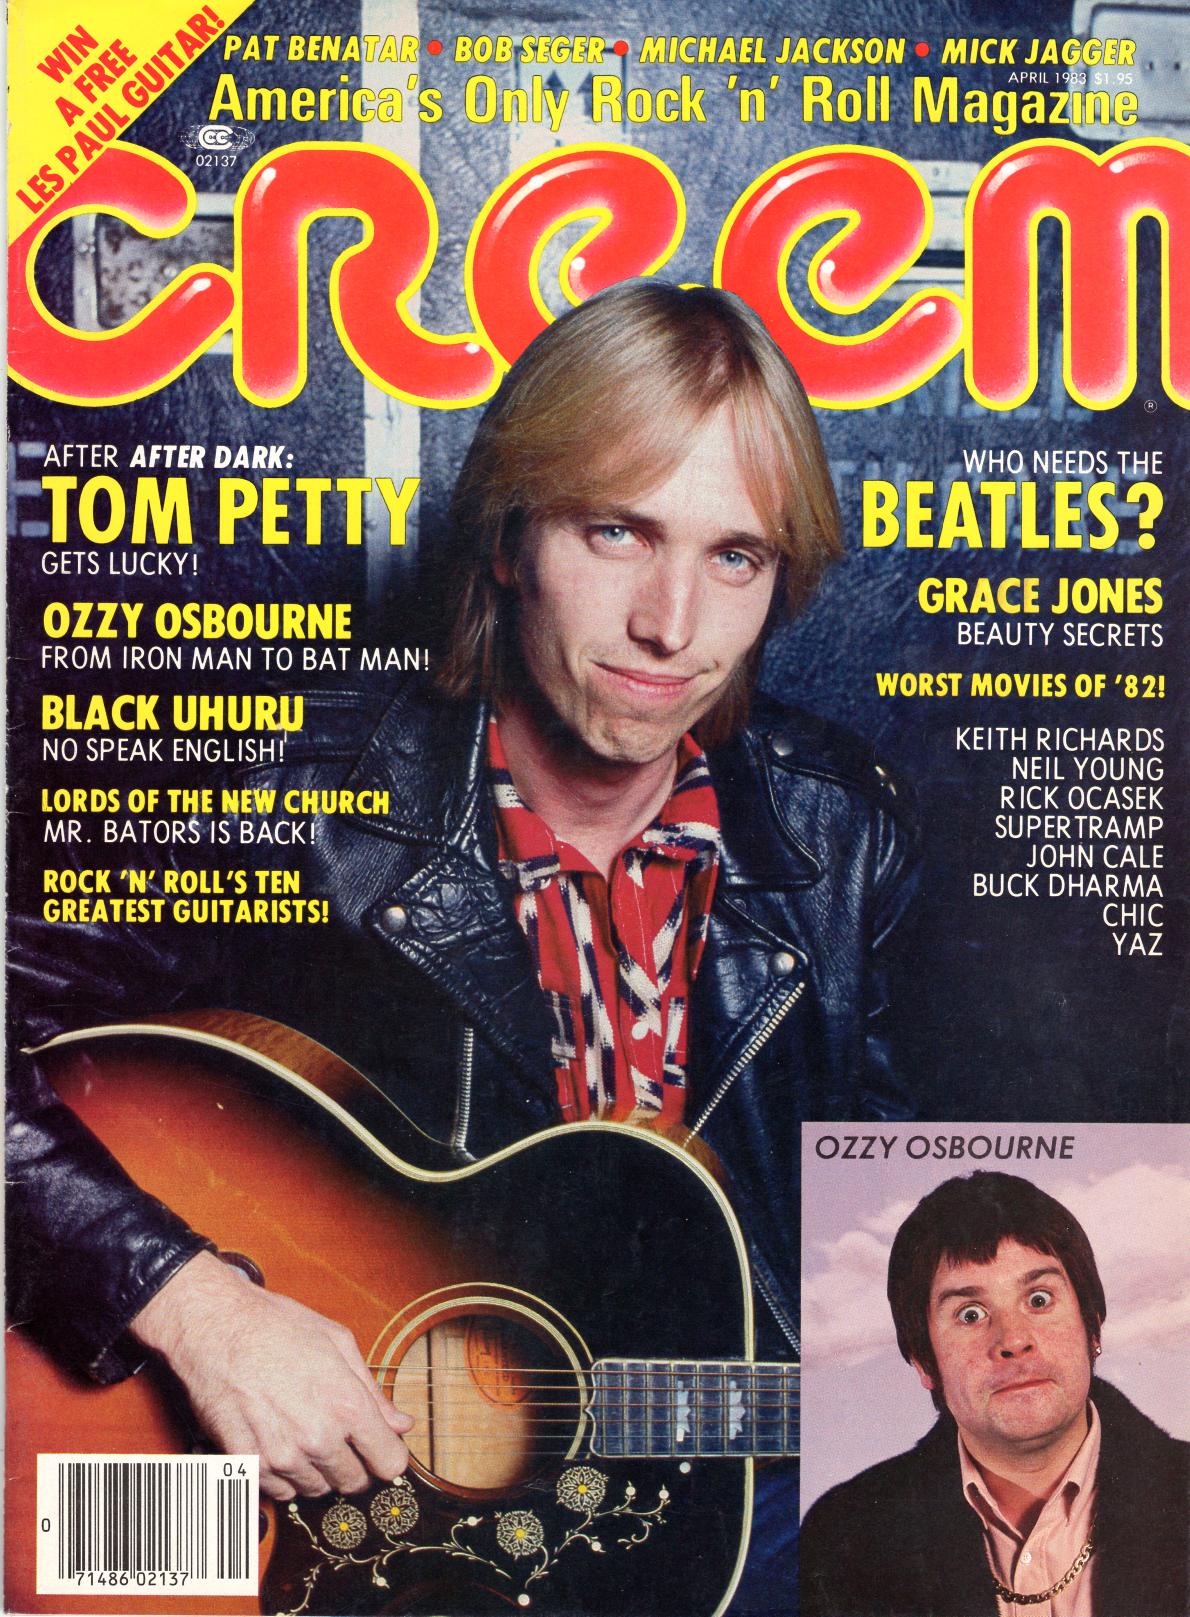 1983-04-xx_Creem-01.png